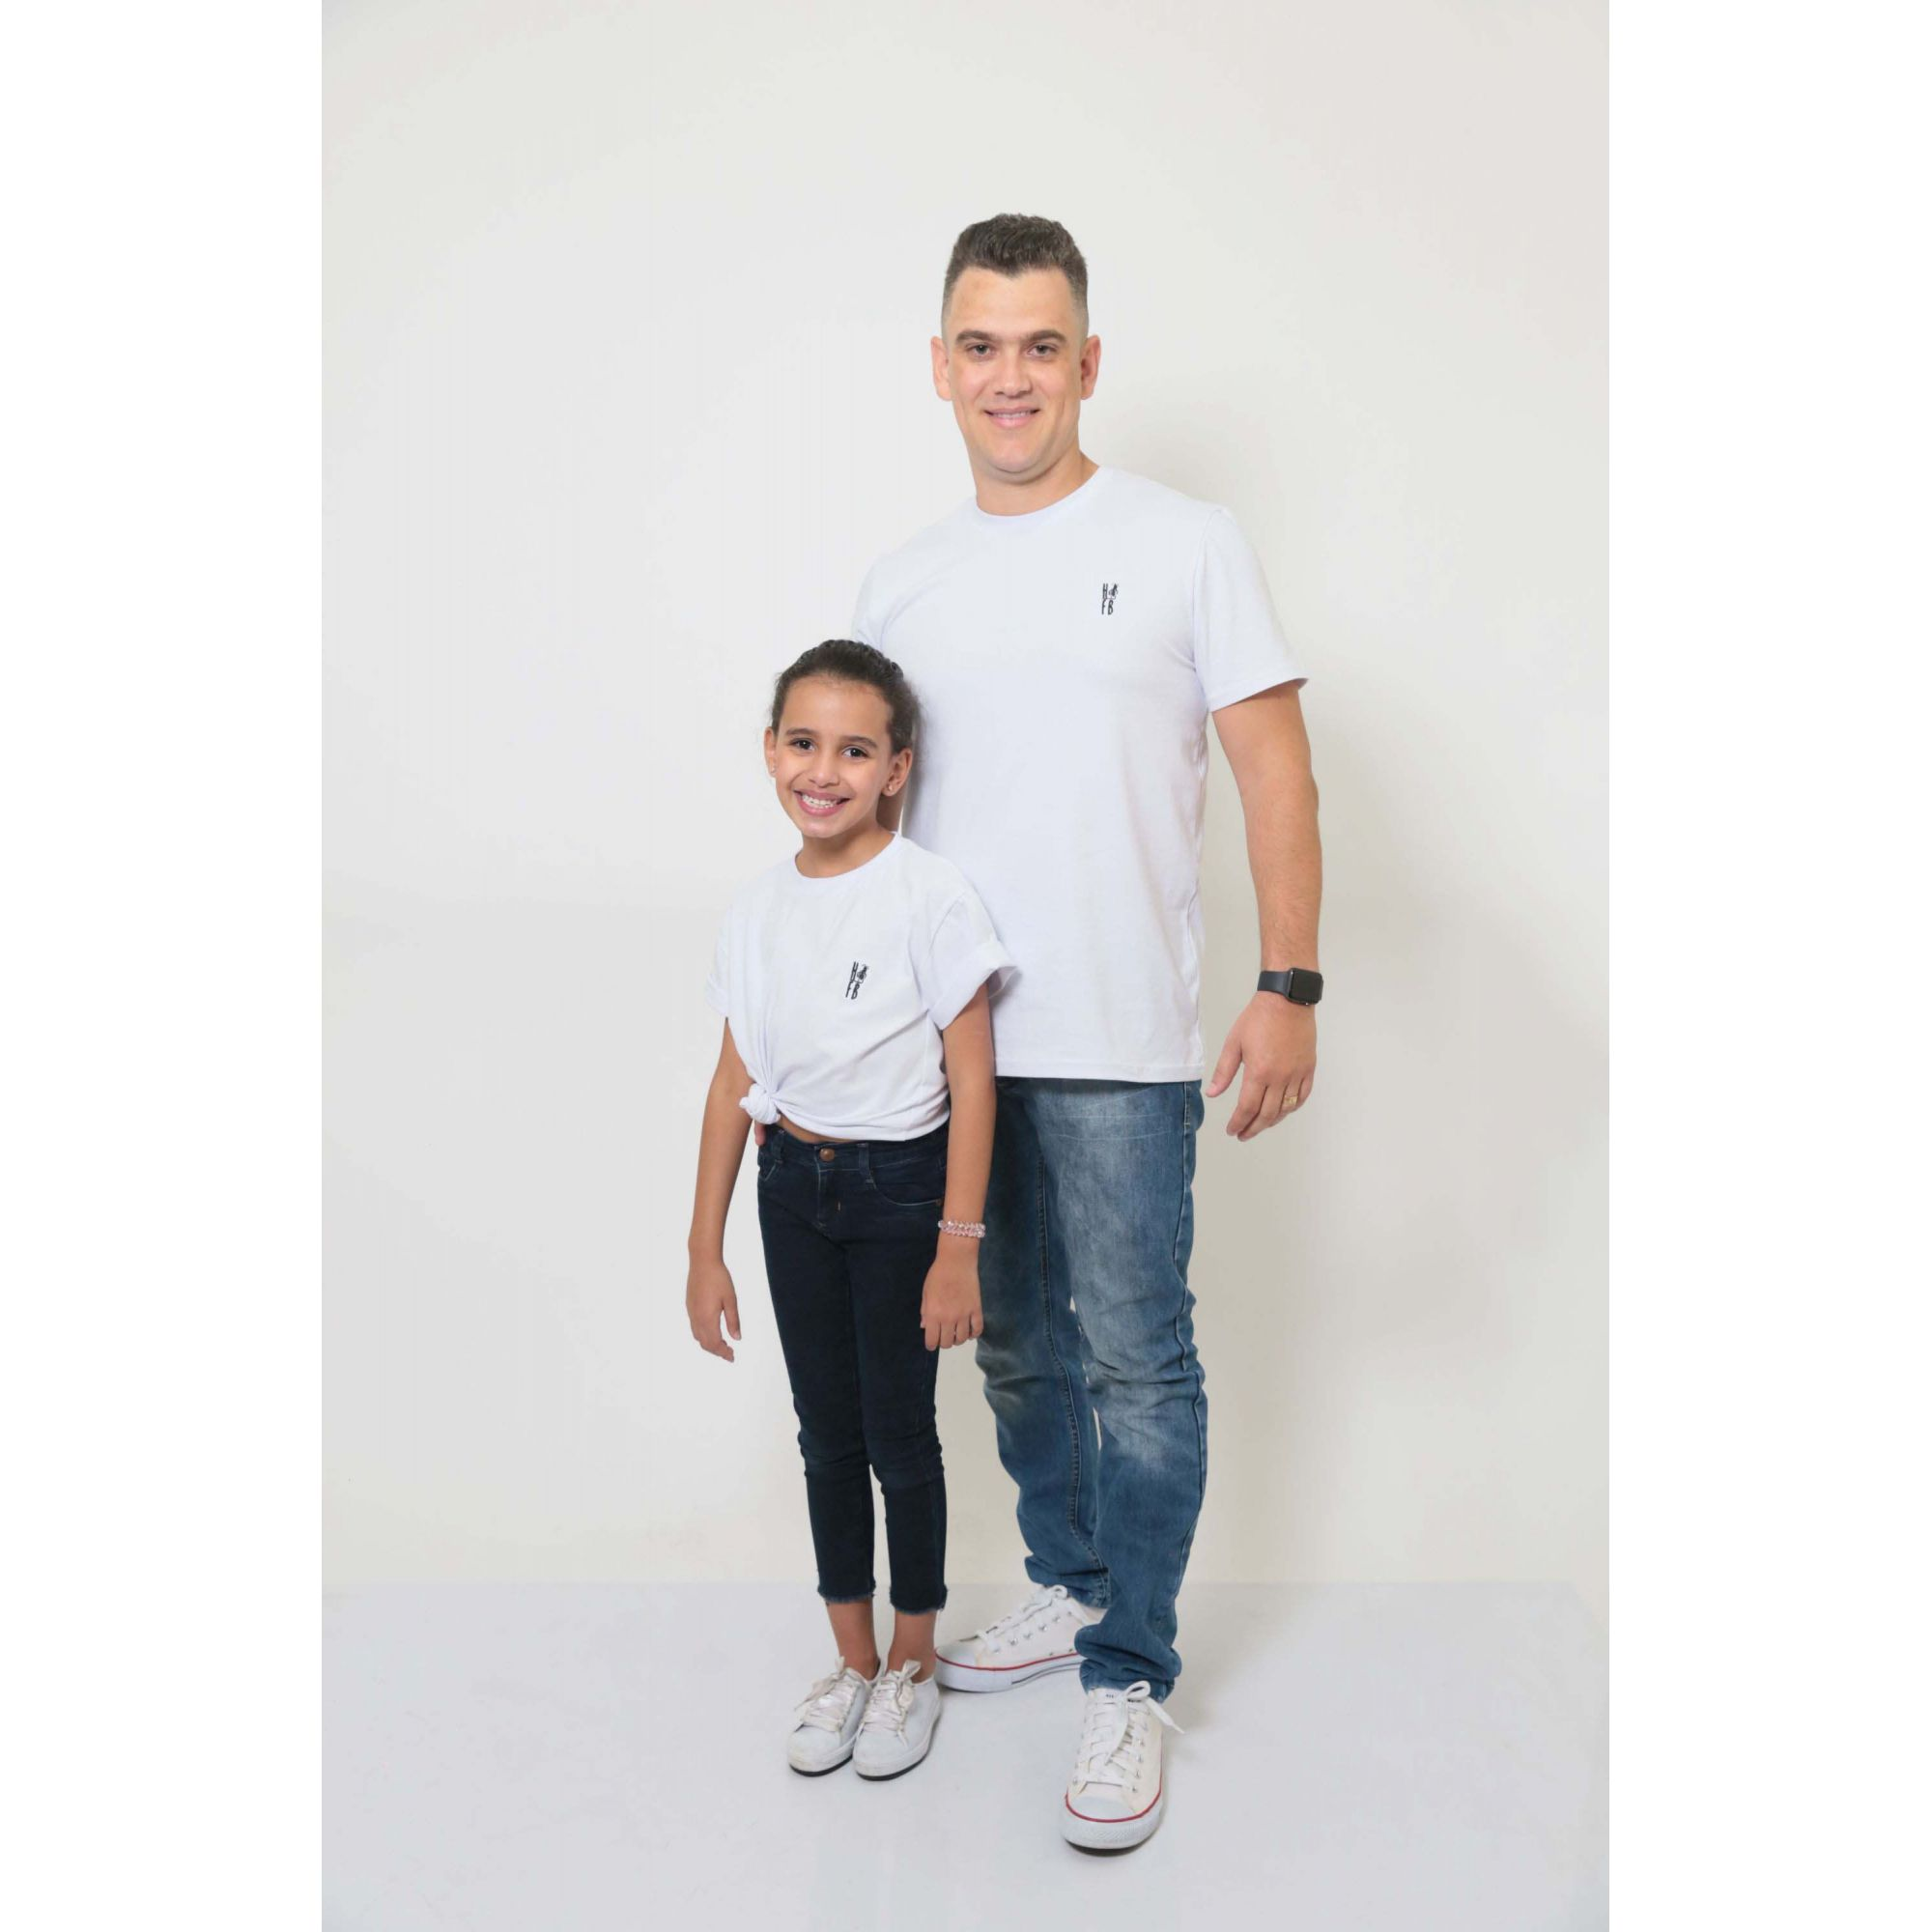 PAI E FILHA > 02 T-Shirts - Branca  [Coleção Tal Pai Tal Filha]